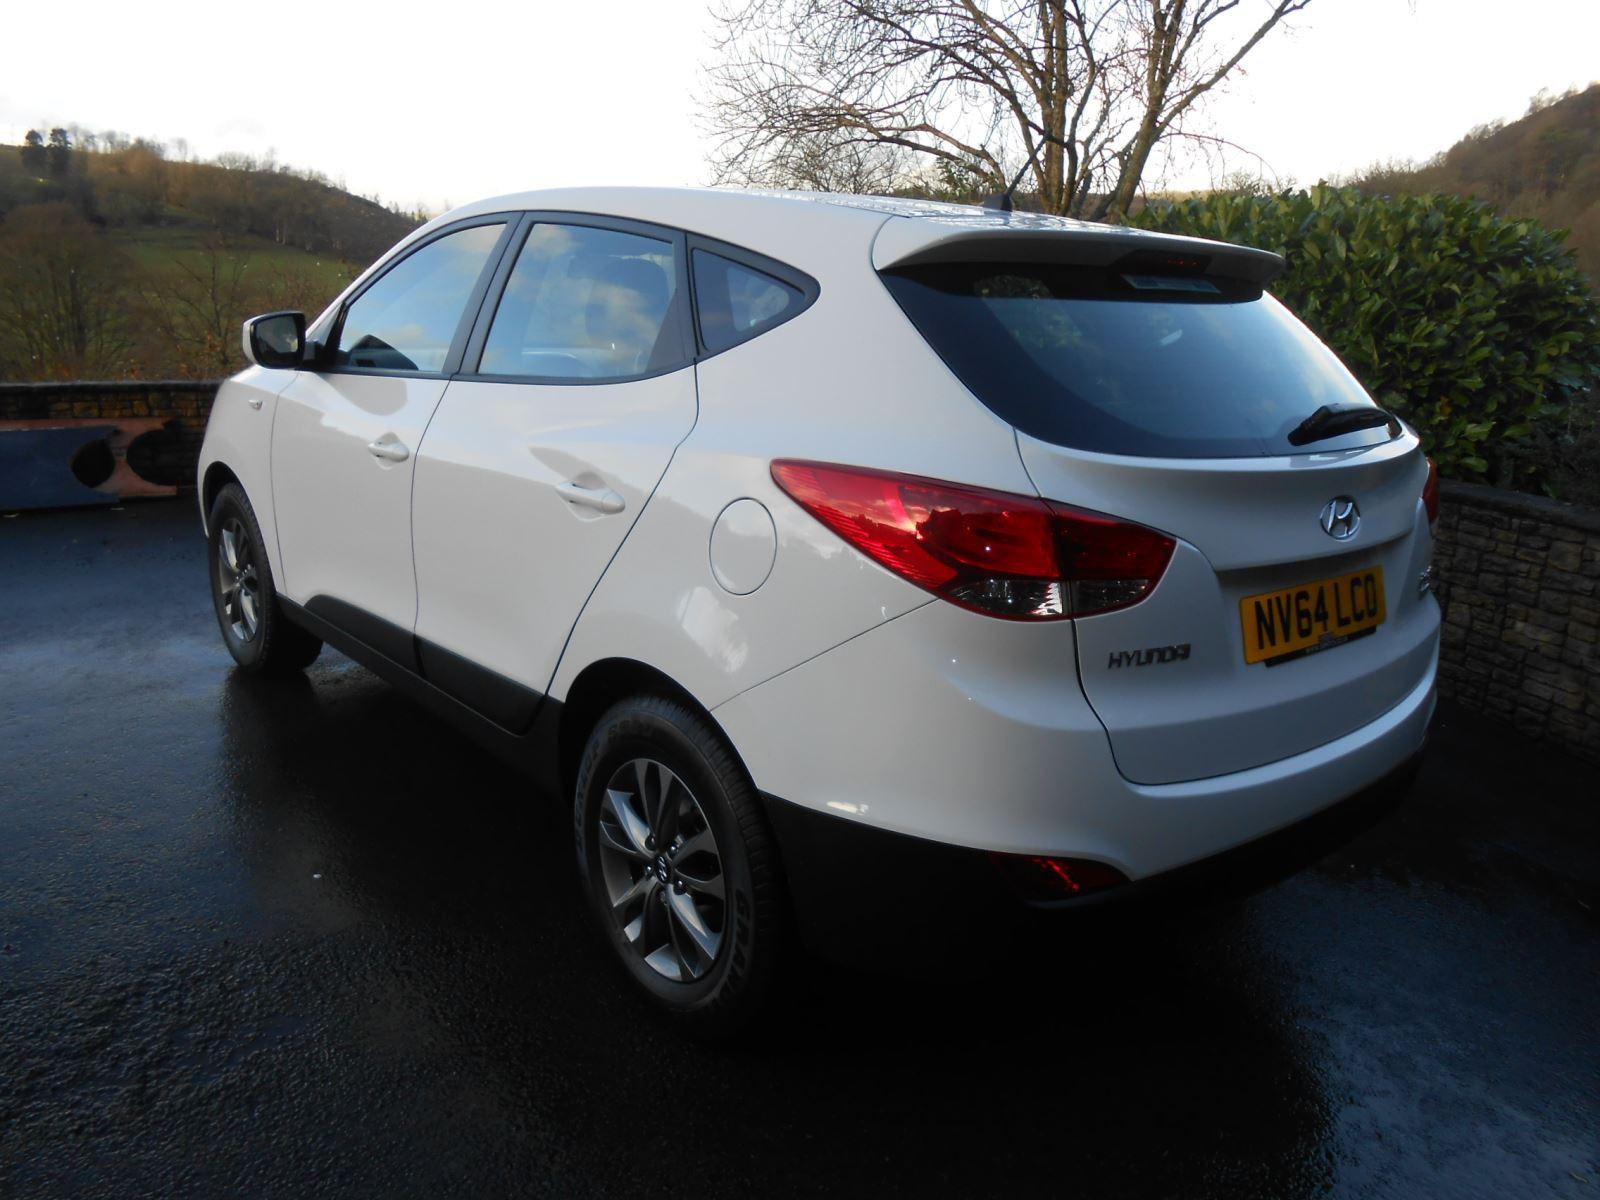 Hyundai Ix35 1 7 Crdi S 5 Door Car For Sale Llanidloes border=